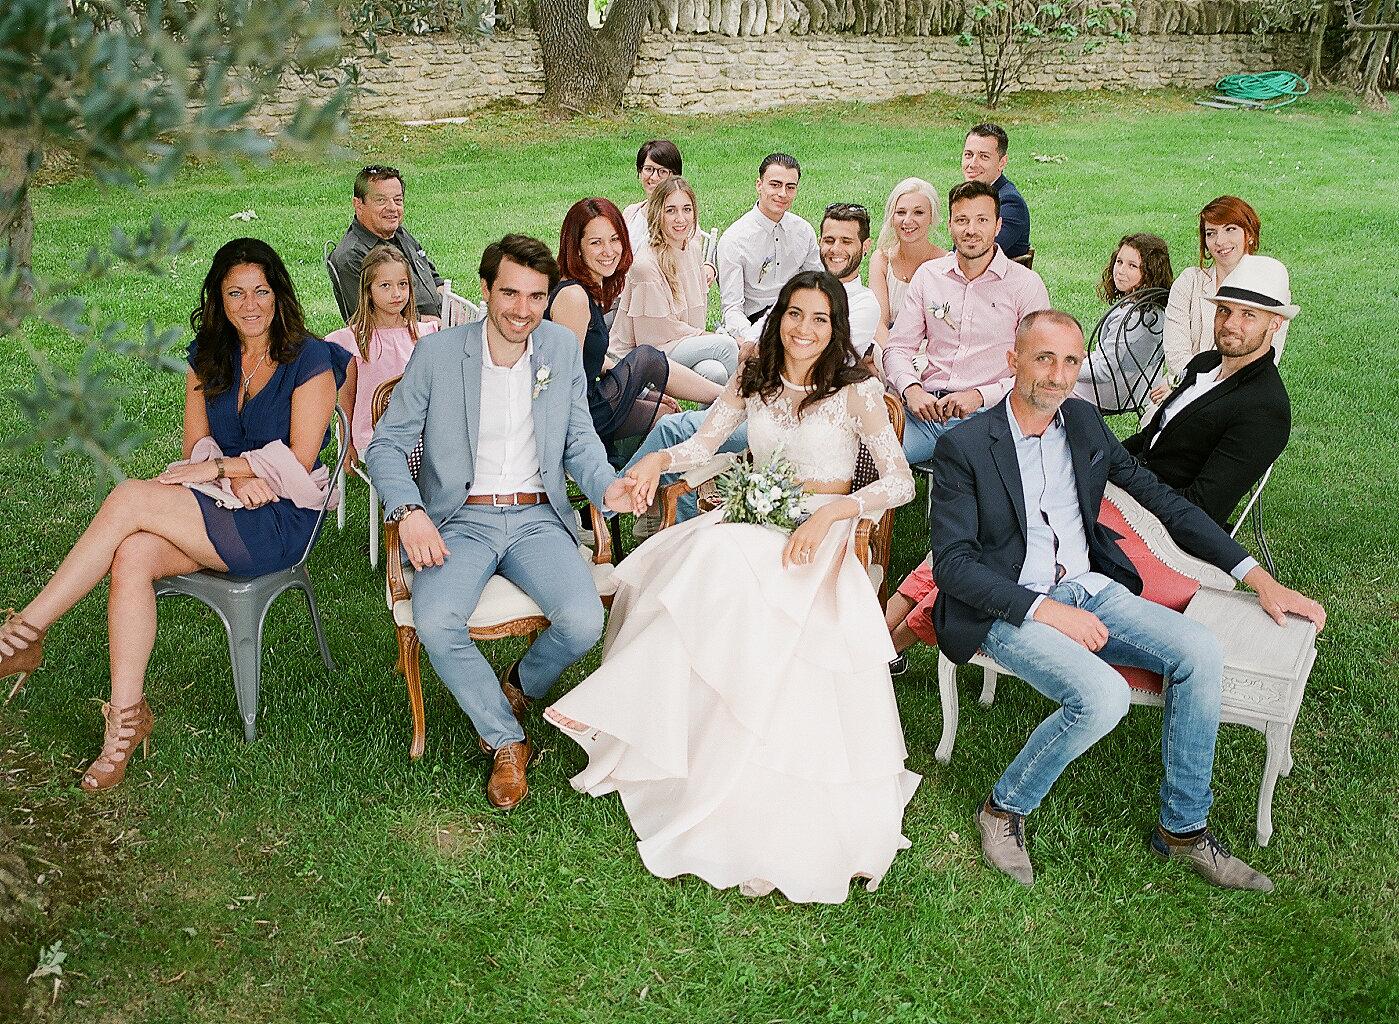 le coeur dans les etoiles - wedding planner - provence - luberon - alpilles - drome - vaucluse - sardaigne - italie - organisation - mariage - shooting - dolce vita - valery villard-332